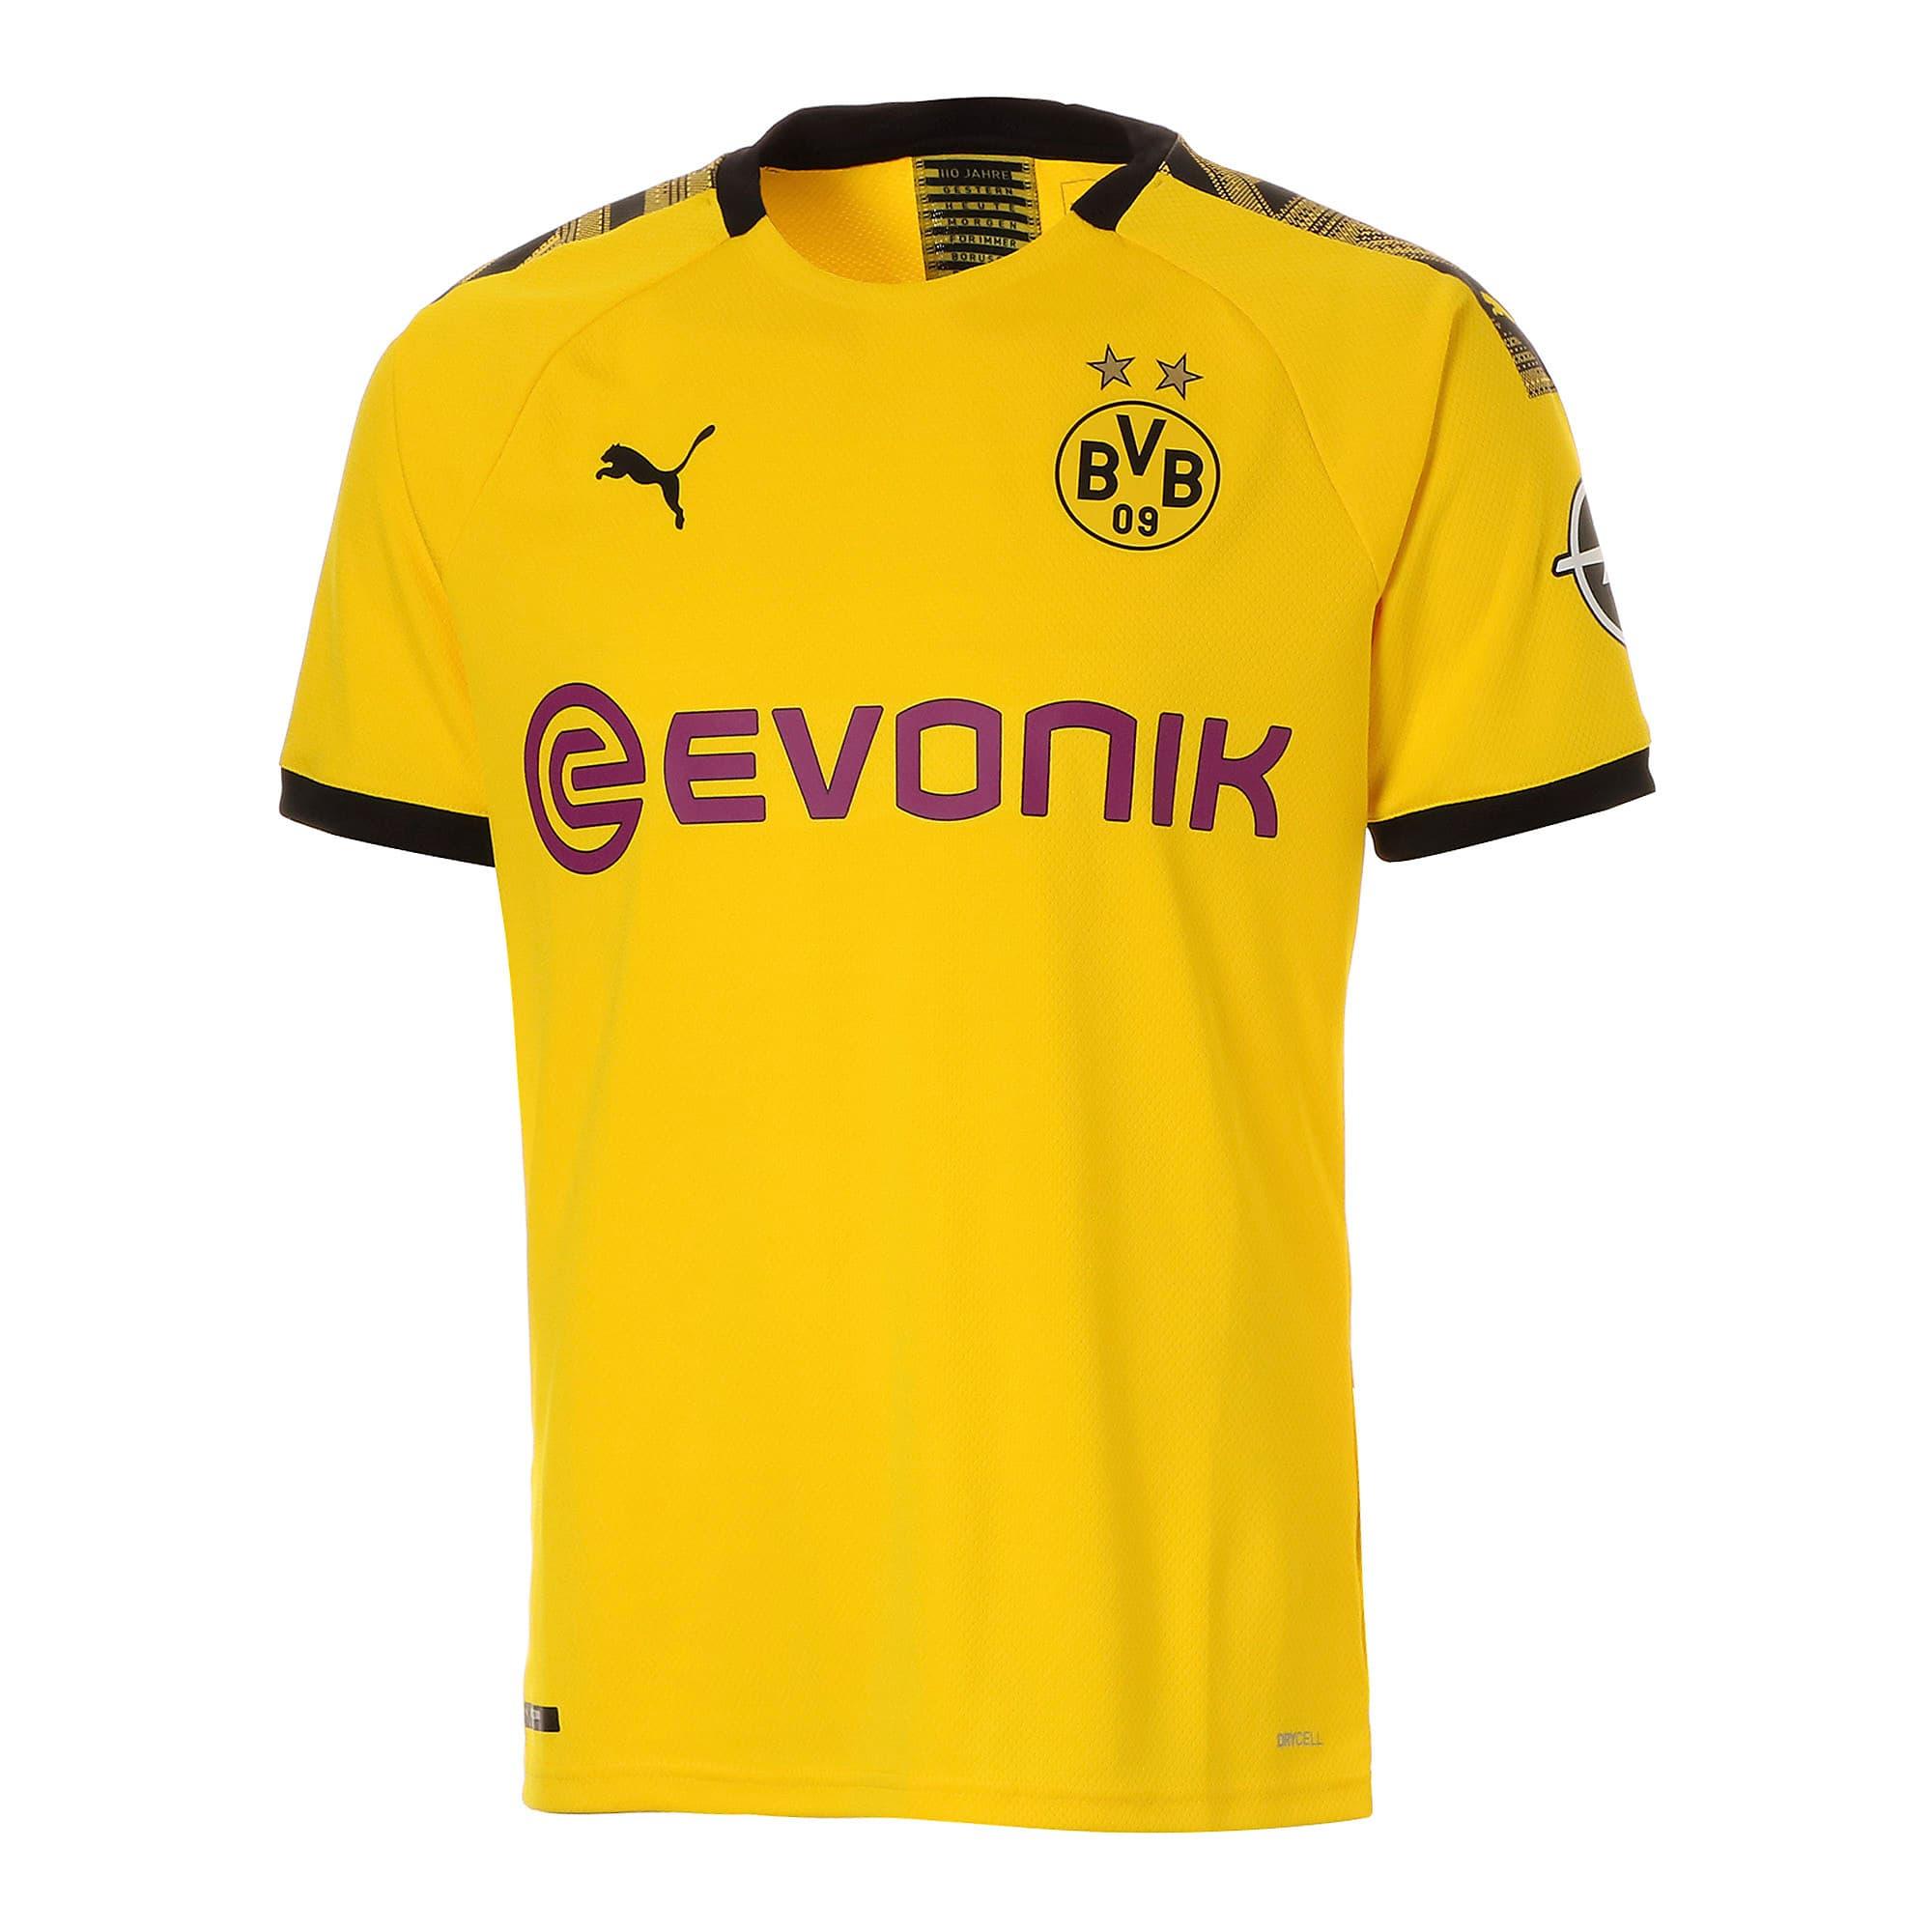 Thumbnail 1 of ドルトムント BVB SS ホーム オーセンティック シャツ 半袖, Cyber Yellow-Puma Black, medium-JPN